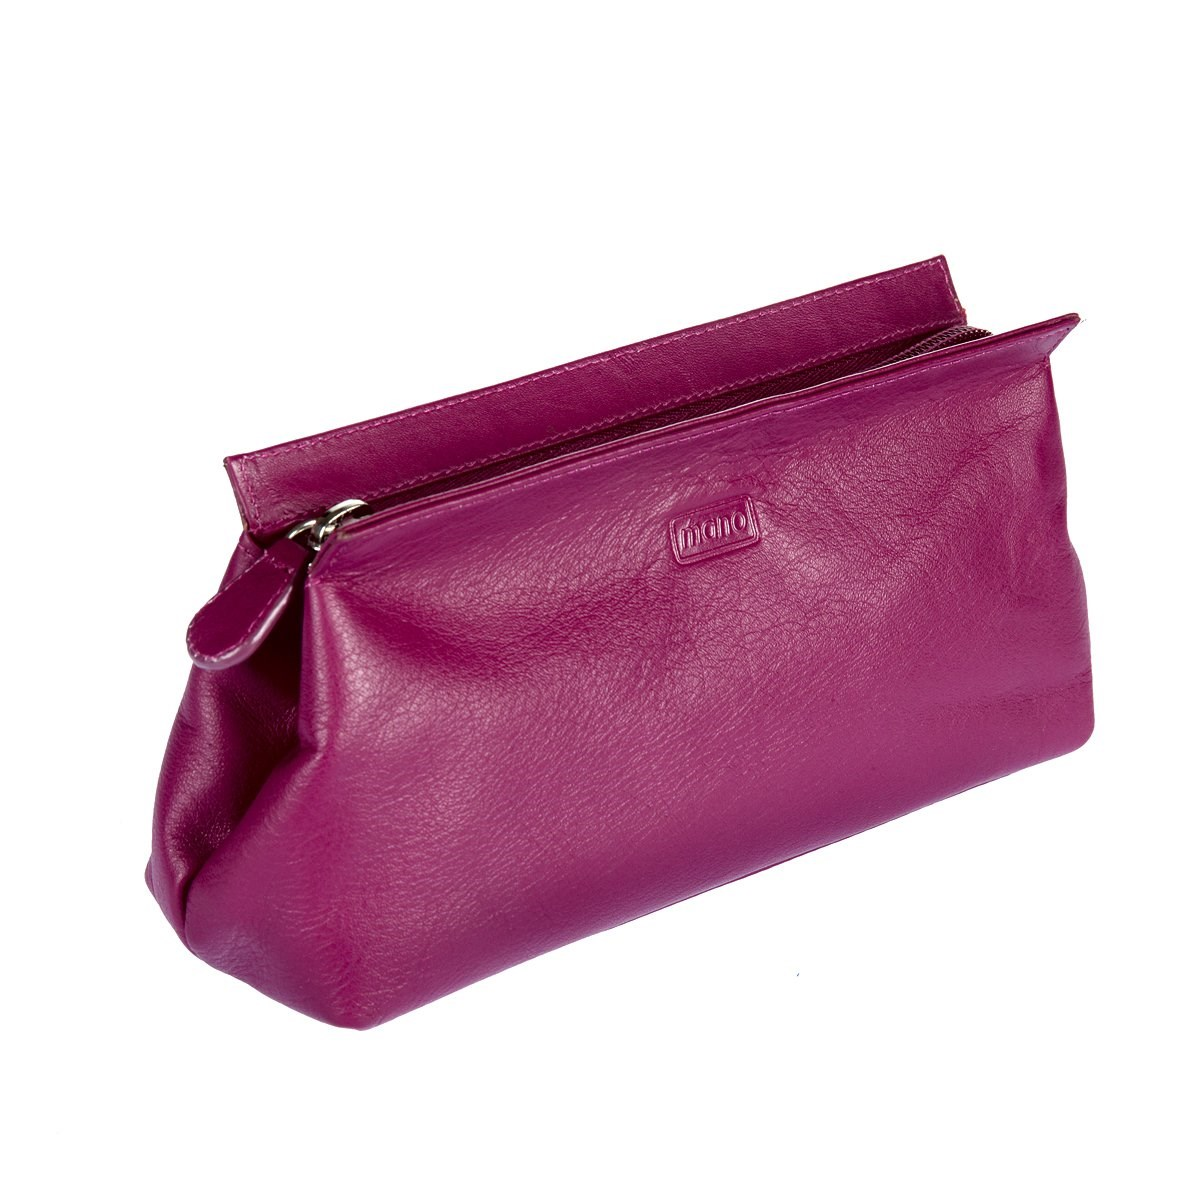 Make Up Bag Mano 13422 SETRU fuchsia кошельки бумажники и портмоне mano 20103 setru black